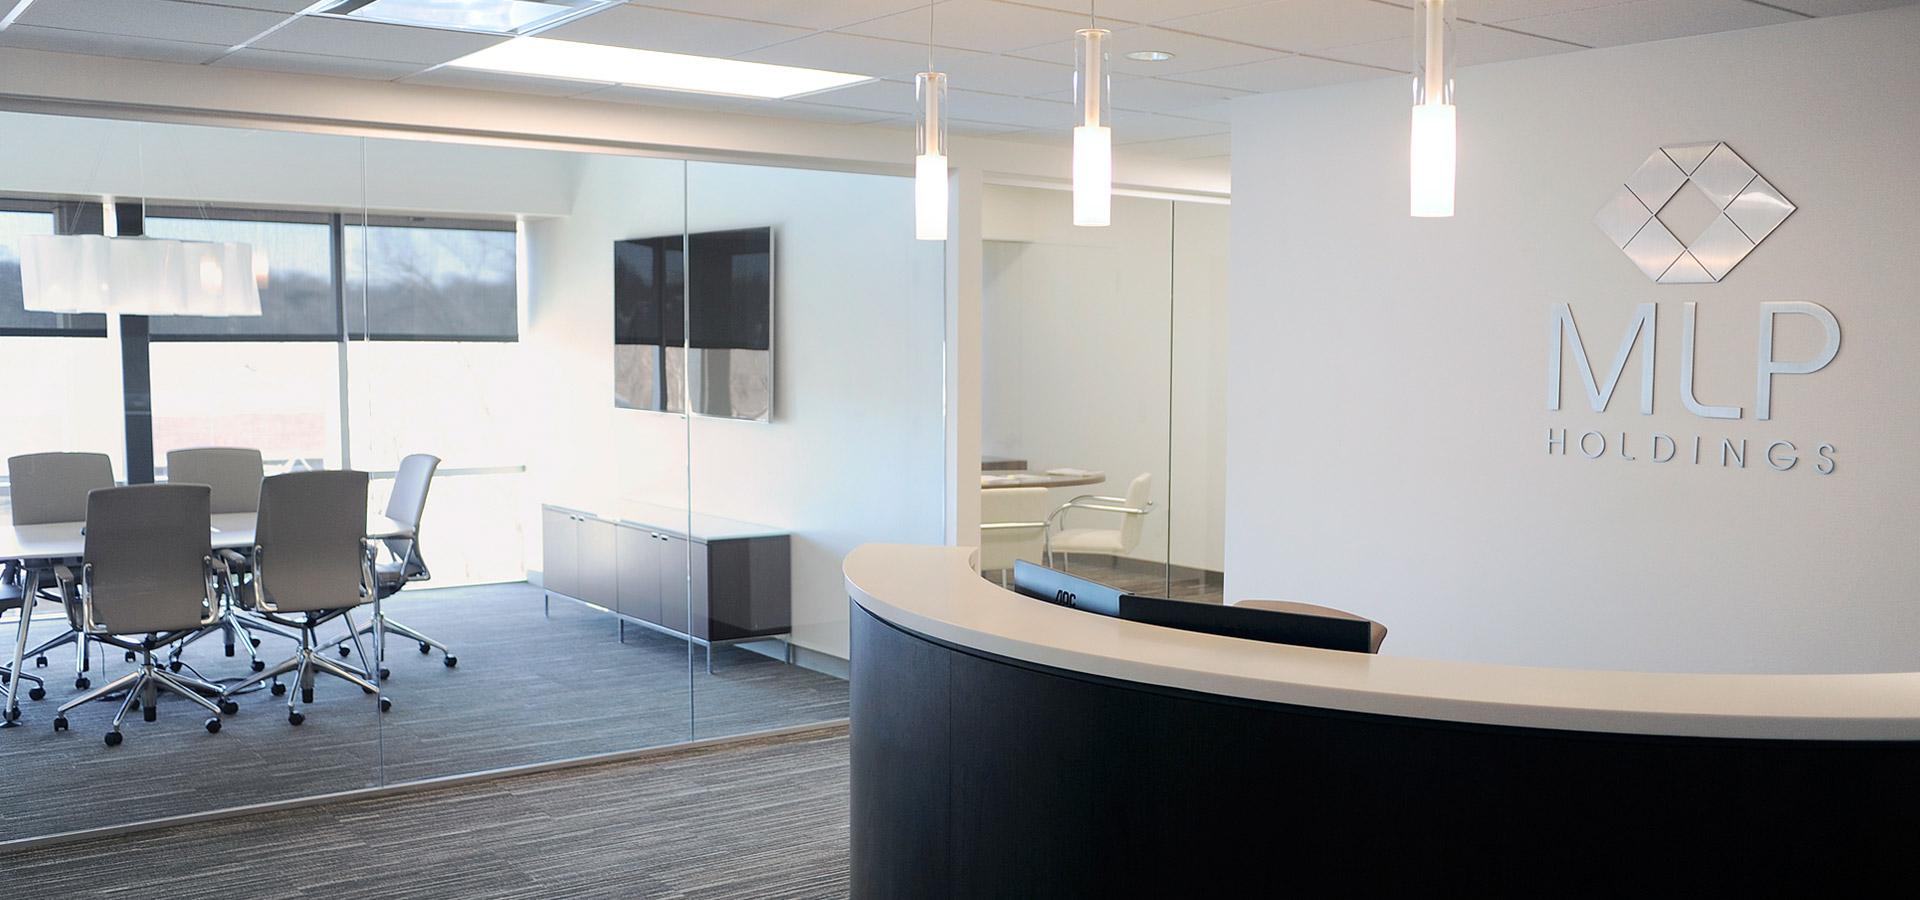 Mlp holding llc jonkman construction for Office 606 design construction llc